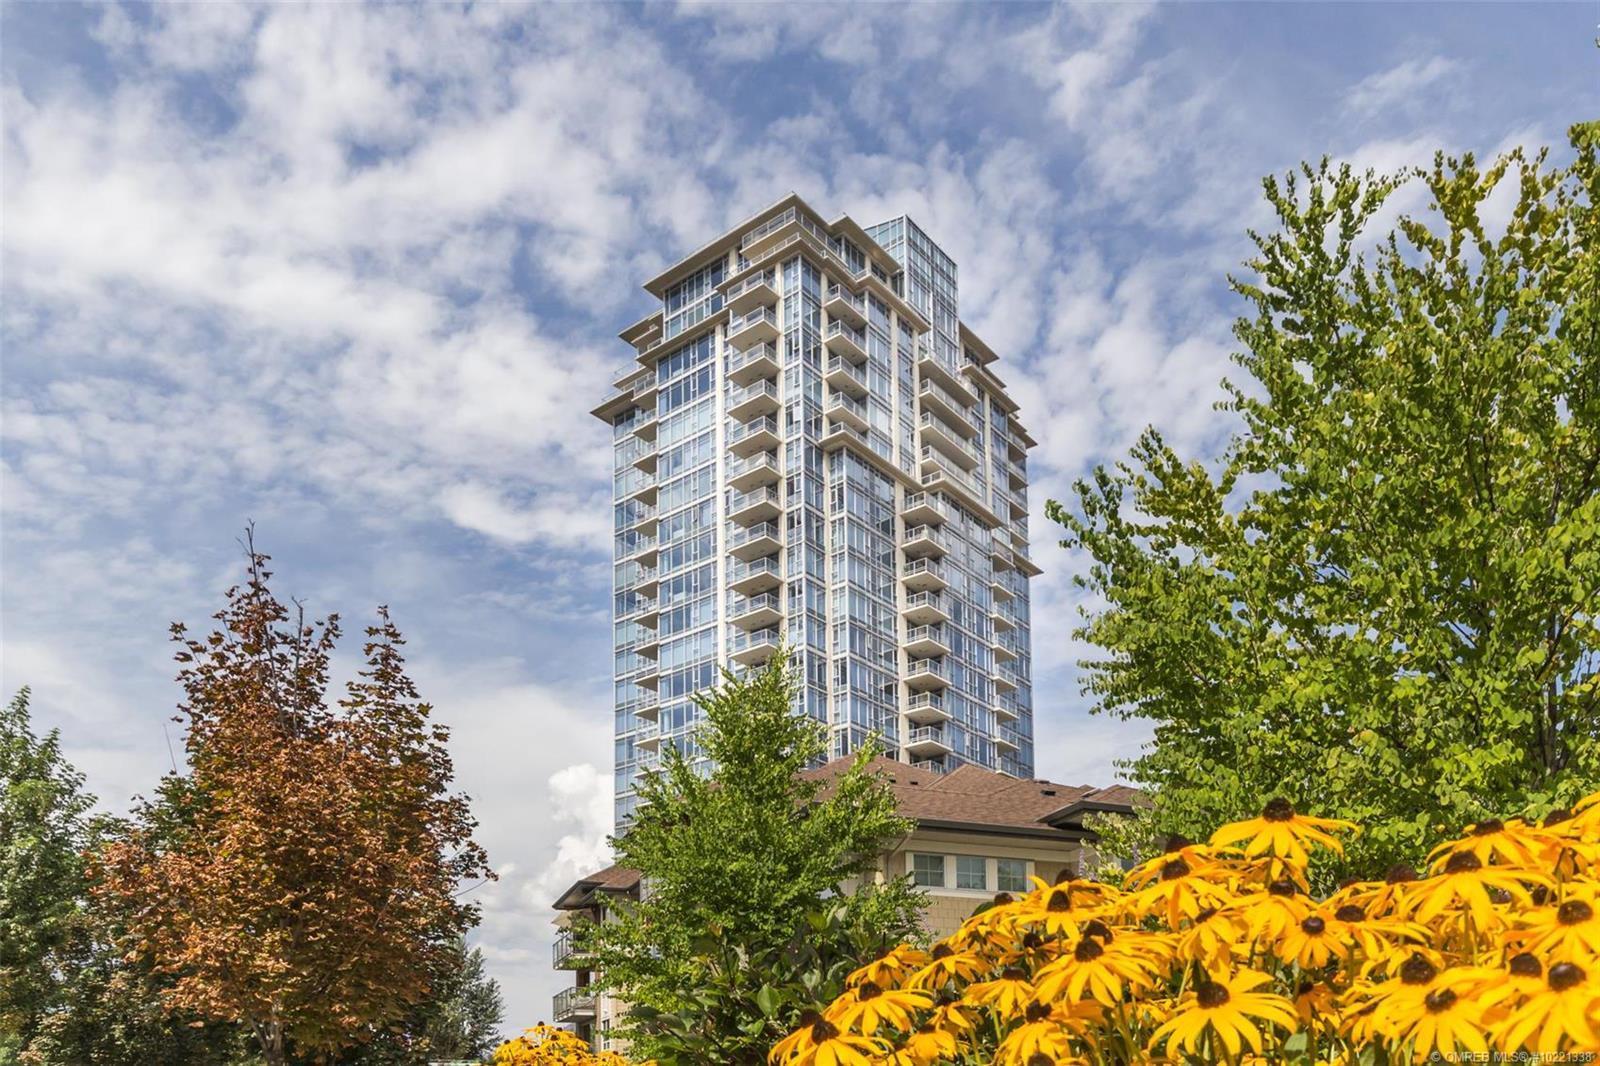 #404 1075 Sunset Drive, - Kelowna Apartment for sale, 1 Bedroom (10221338) - #16